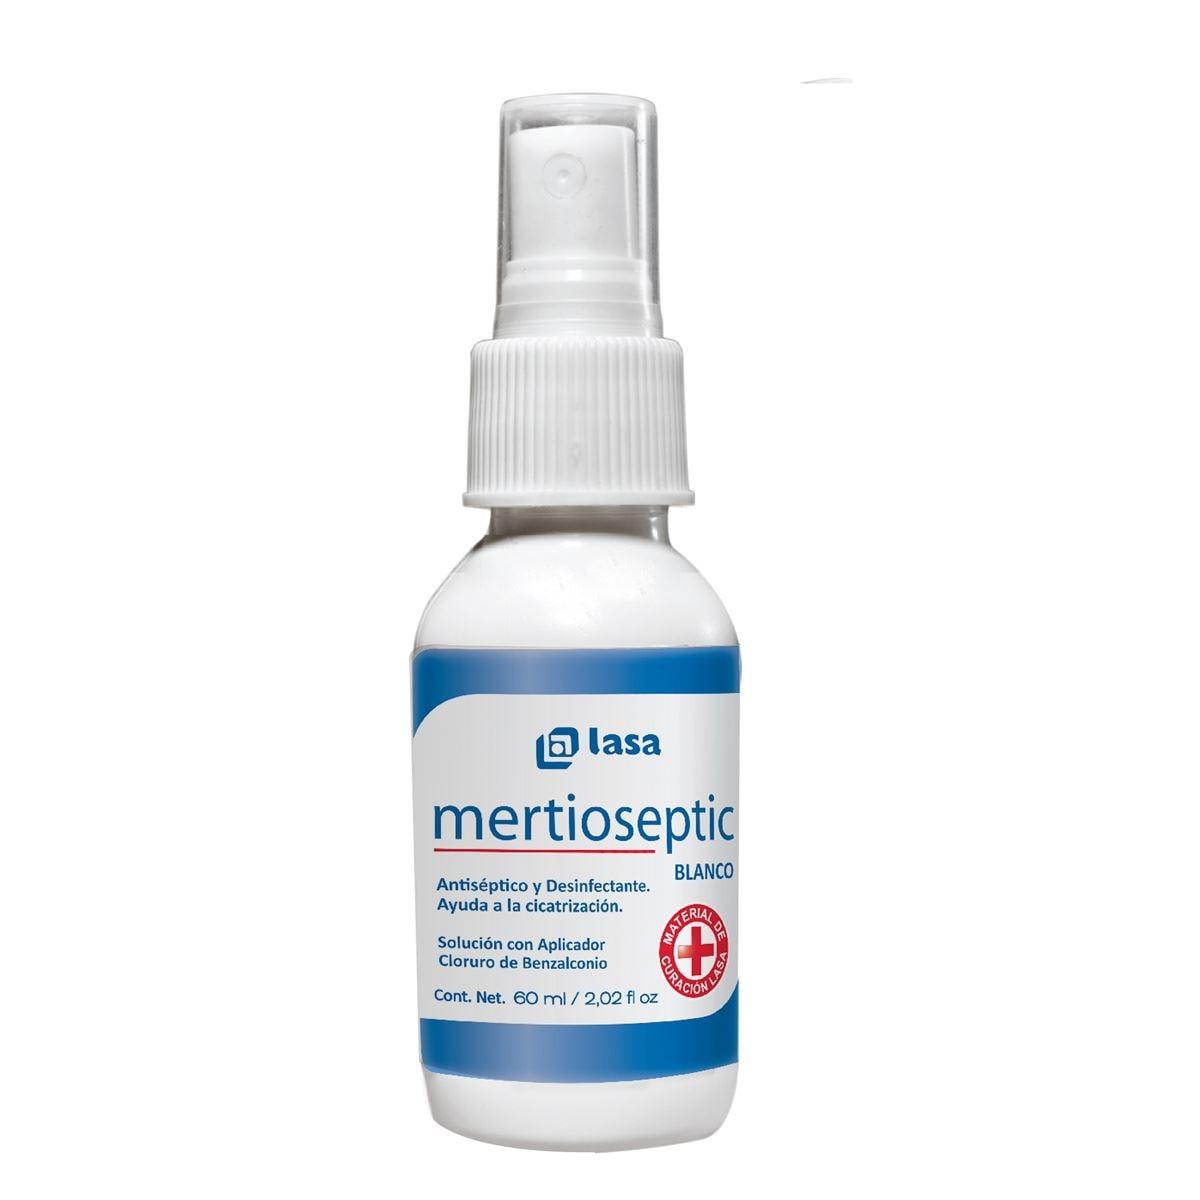 Mertioseptic Blanco